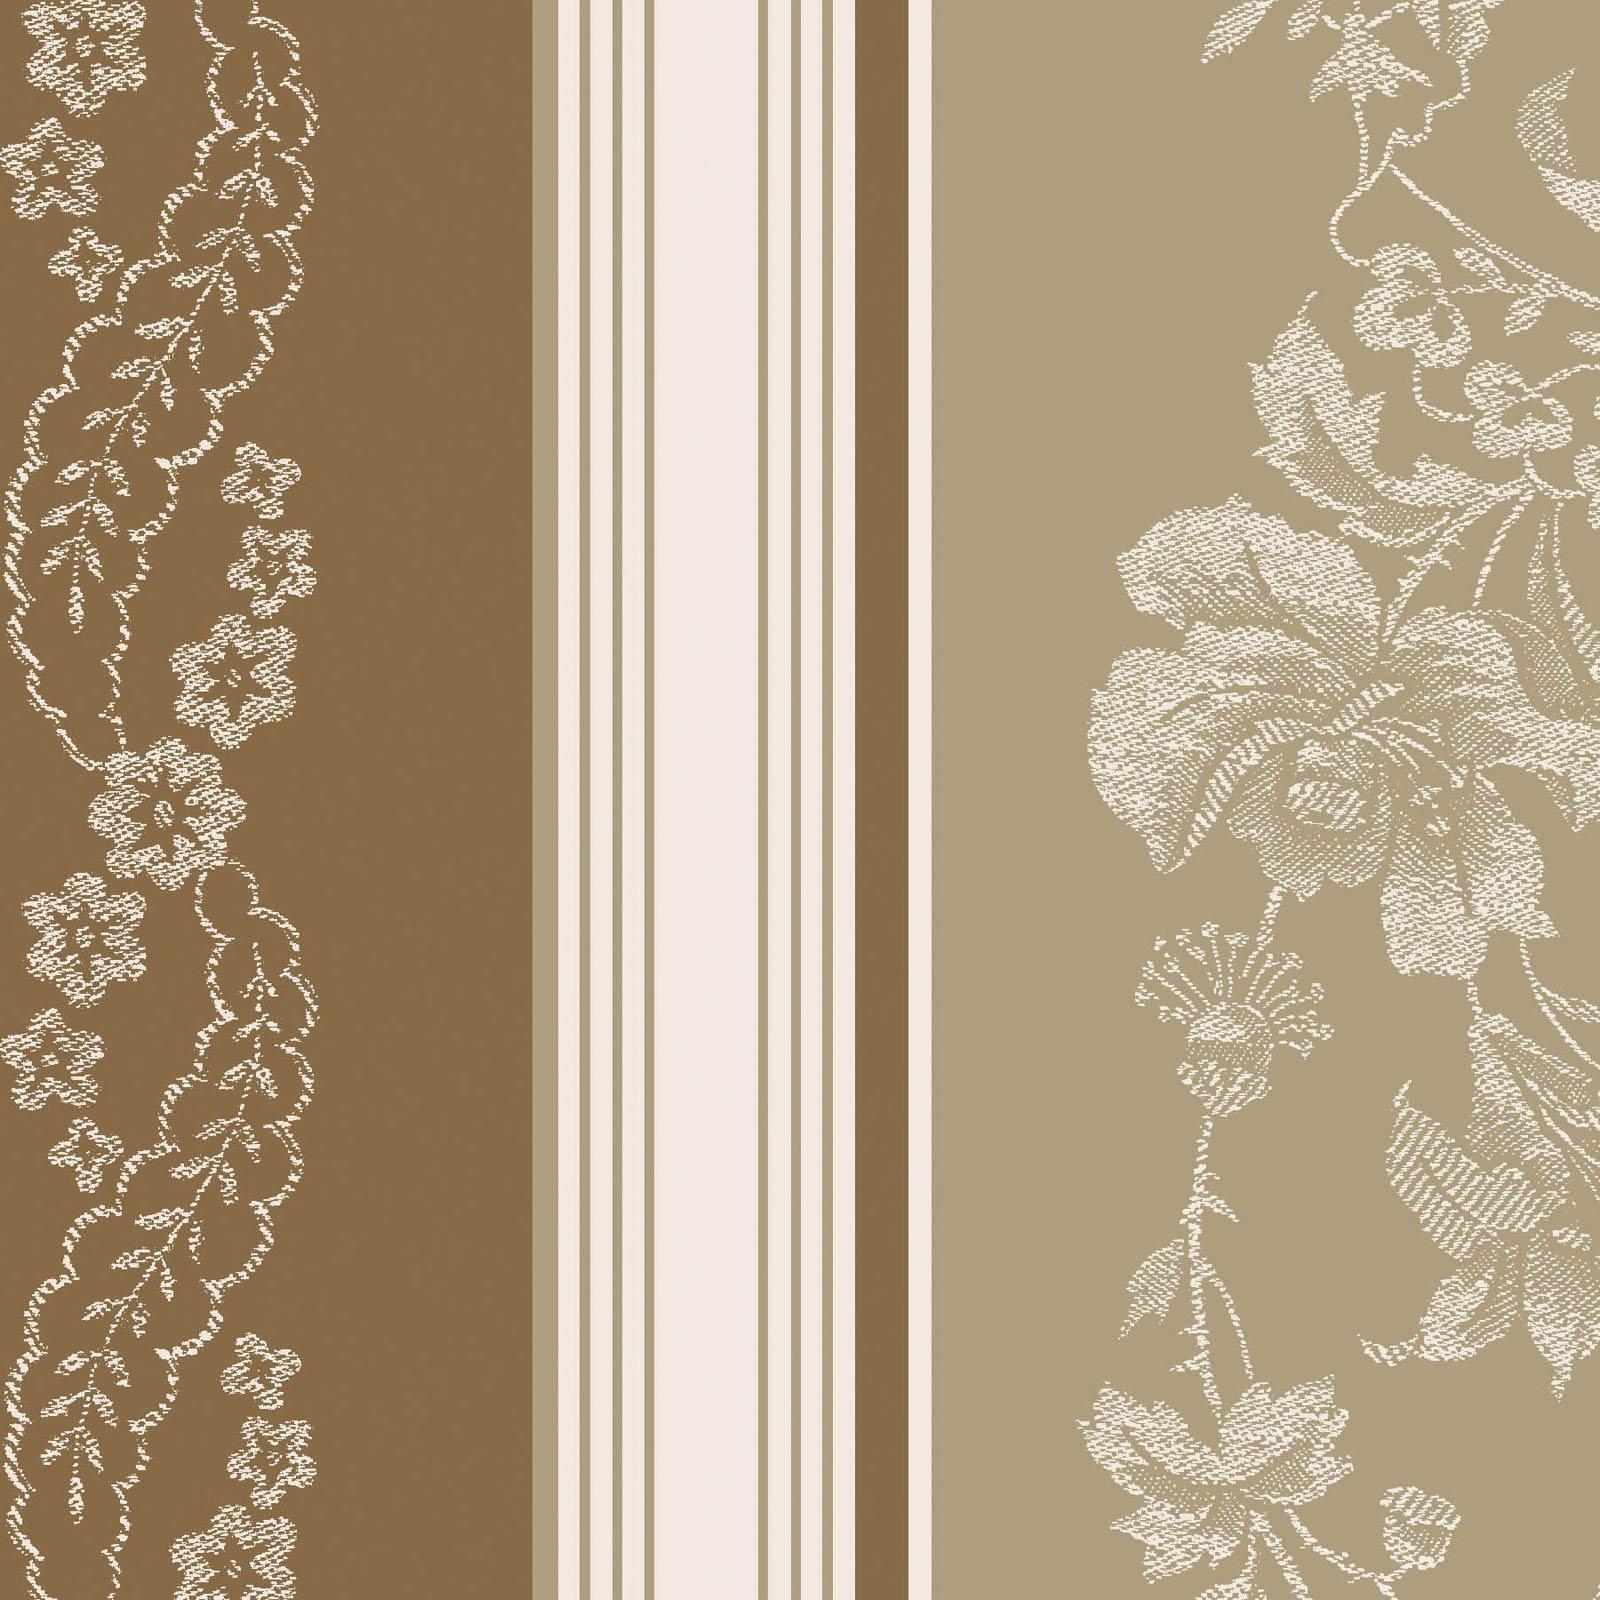 Ruby - Jacquard Texture Stripe - Tan/Brown